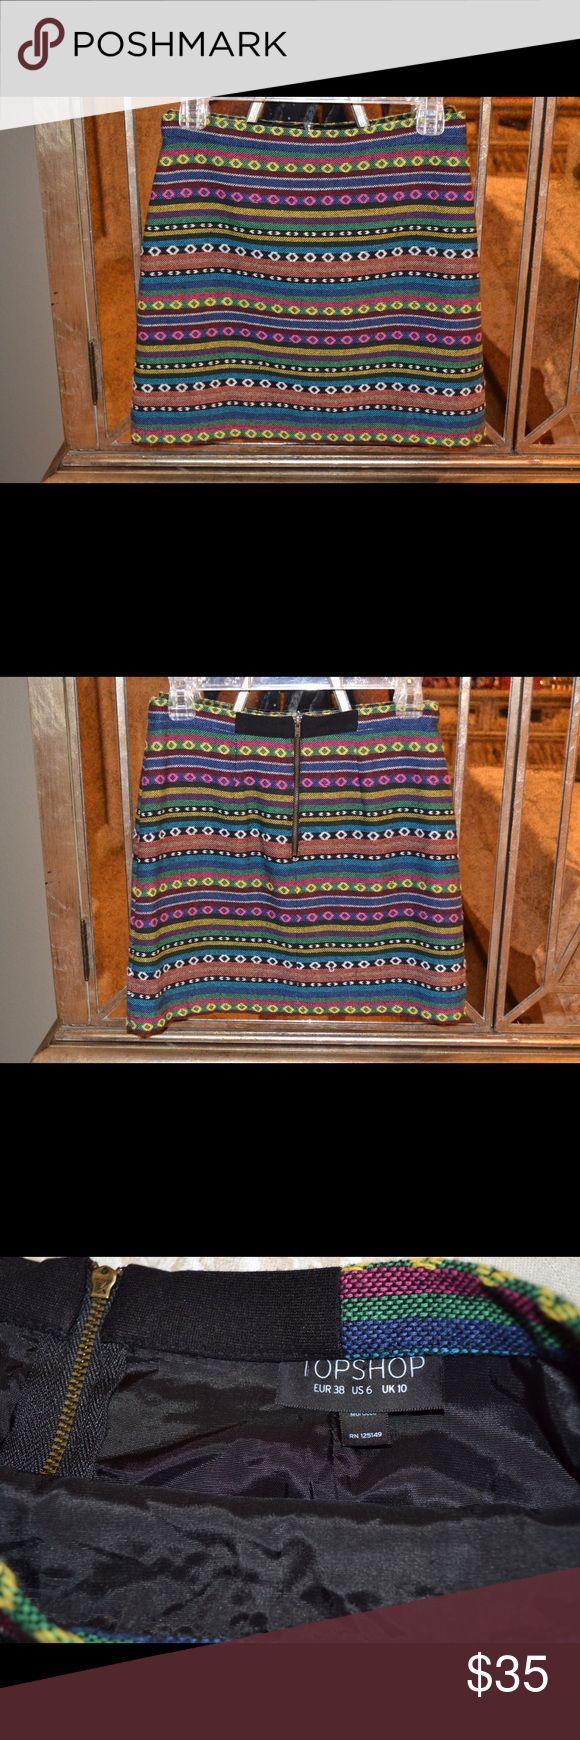 Topshop skirt Topshop skirt. beautiful stitching. US size 6 Topshop Skirts Mini